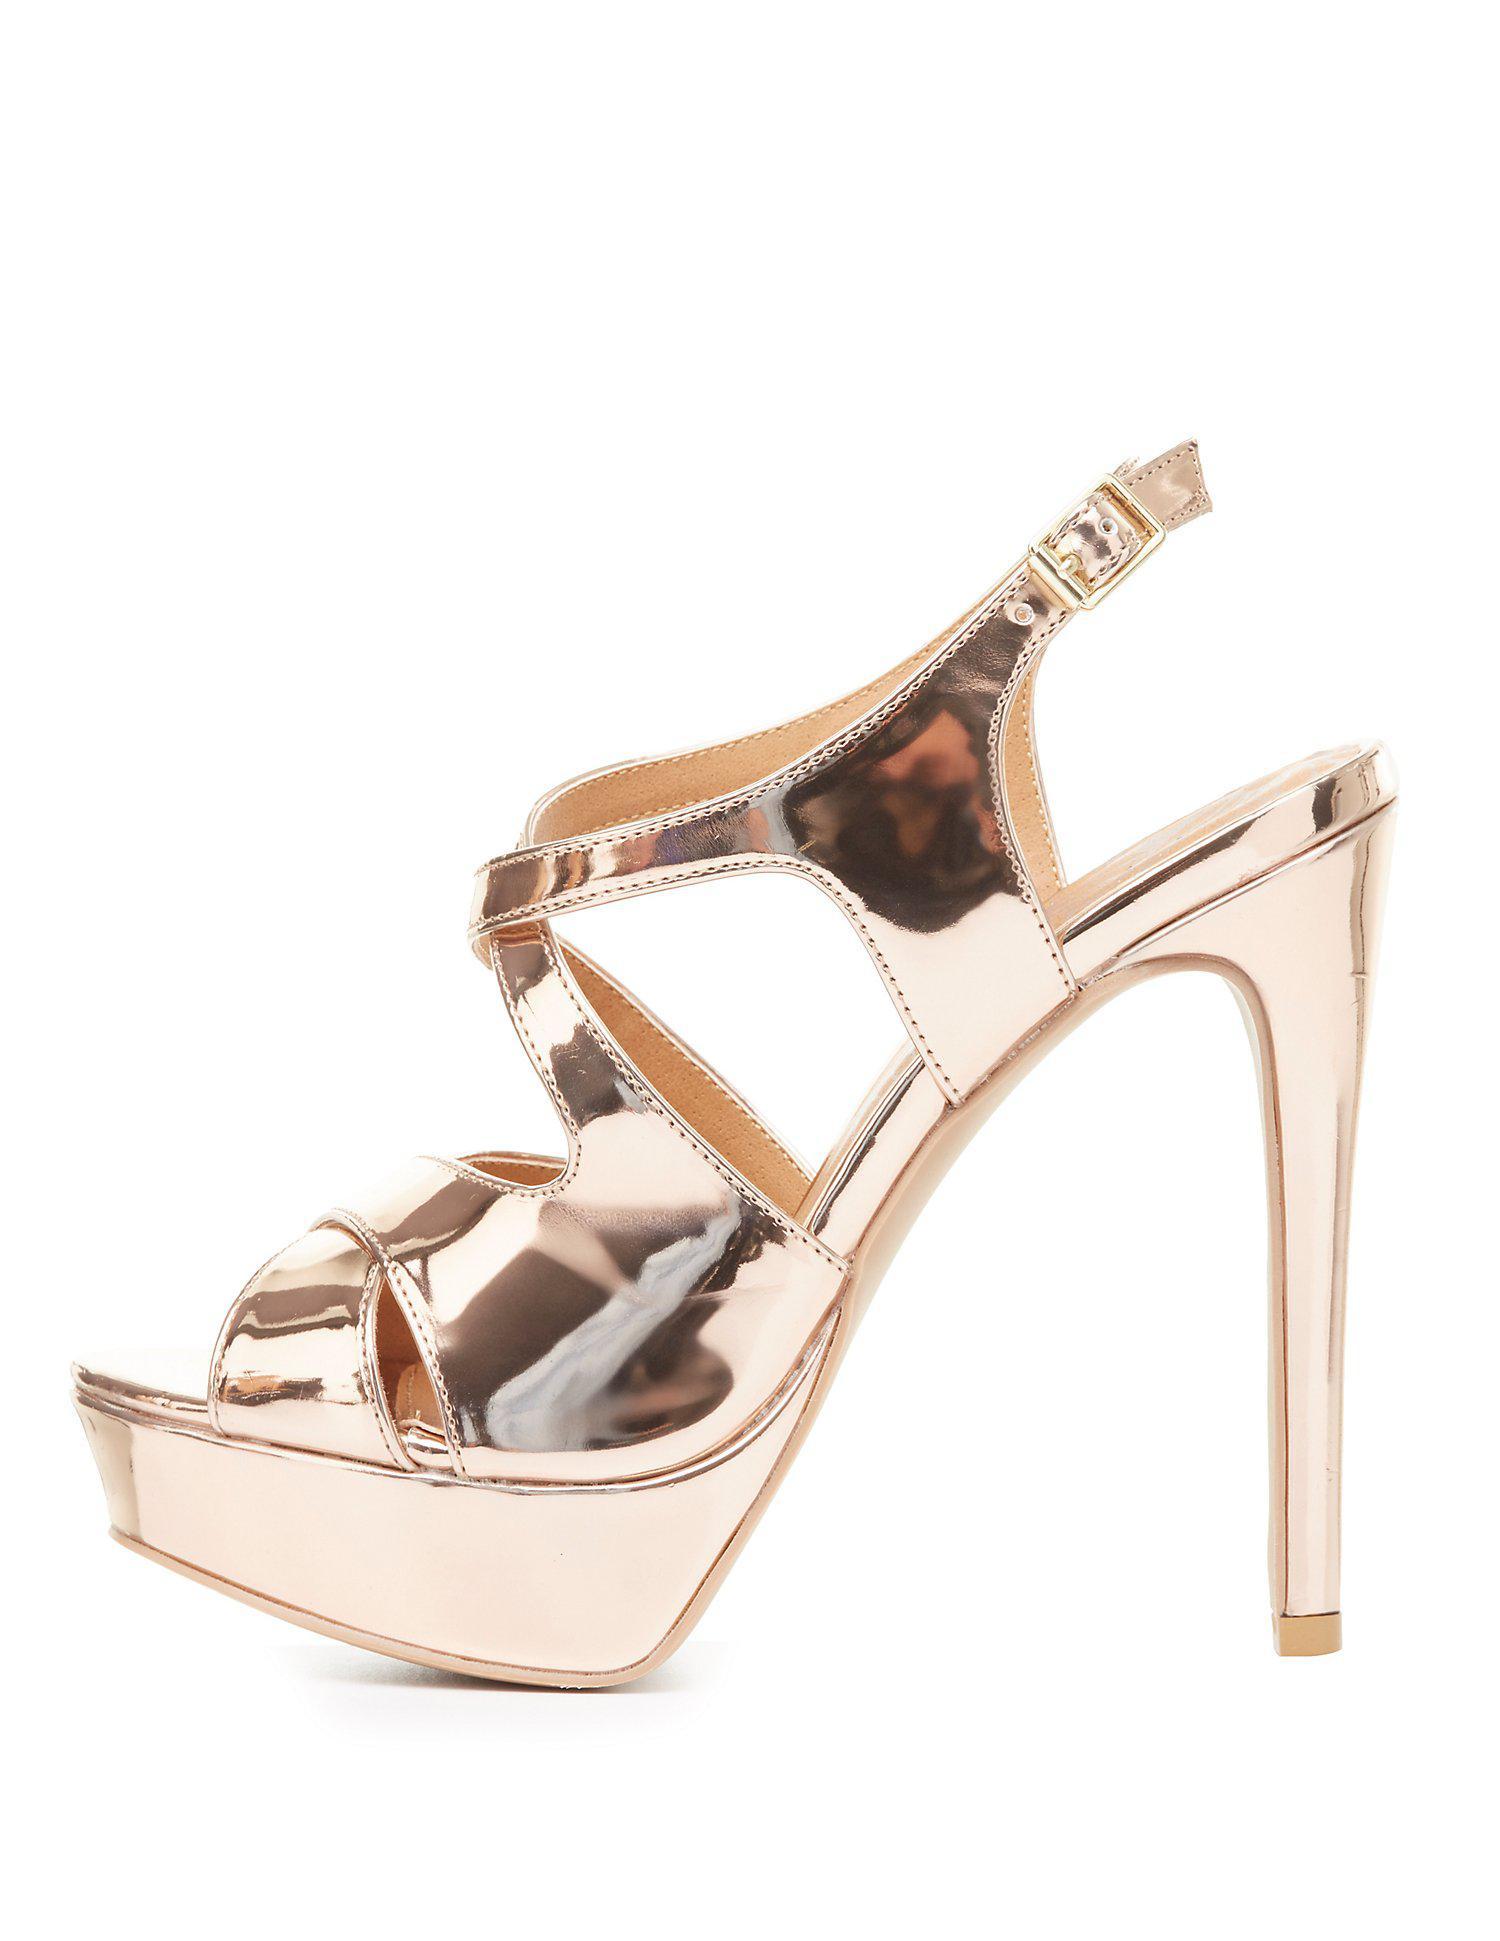 fe98473f5046 Lyst - Charlotte Russe Qupid Platform Slingback Sandals